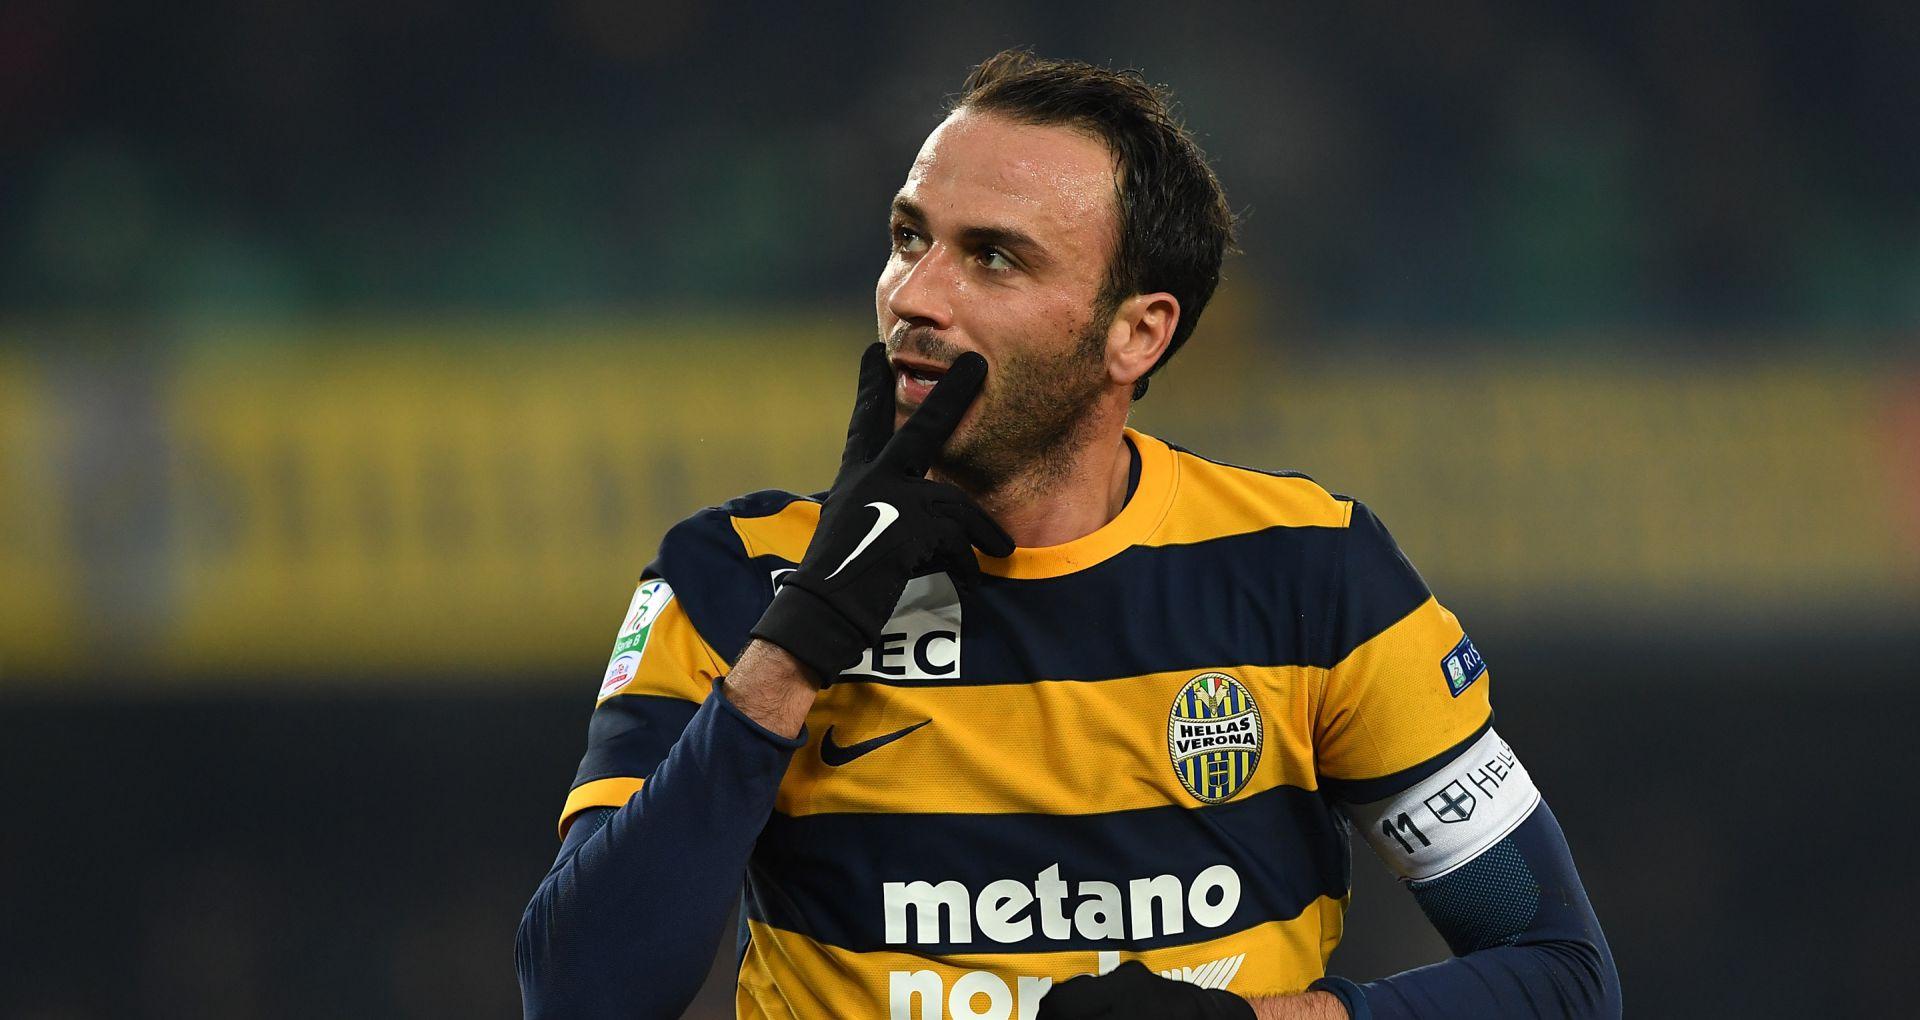 Serie B: il Verona torna in A, Frosinone ai playoff